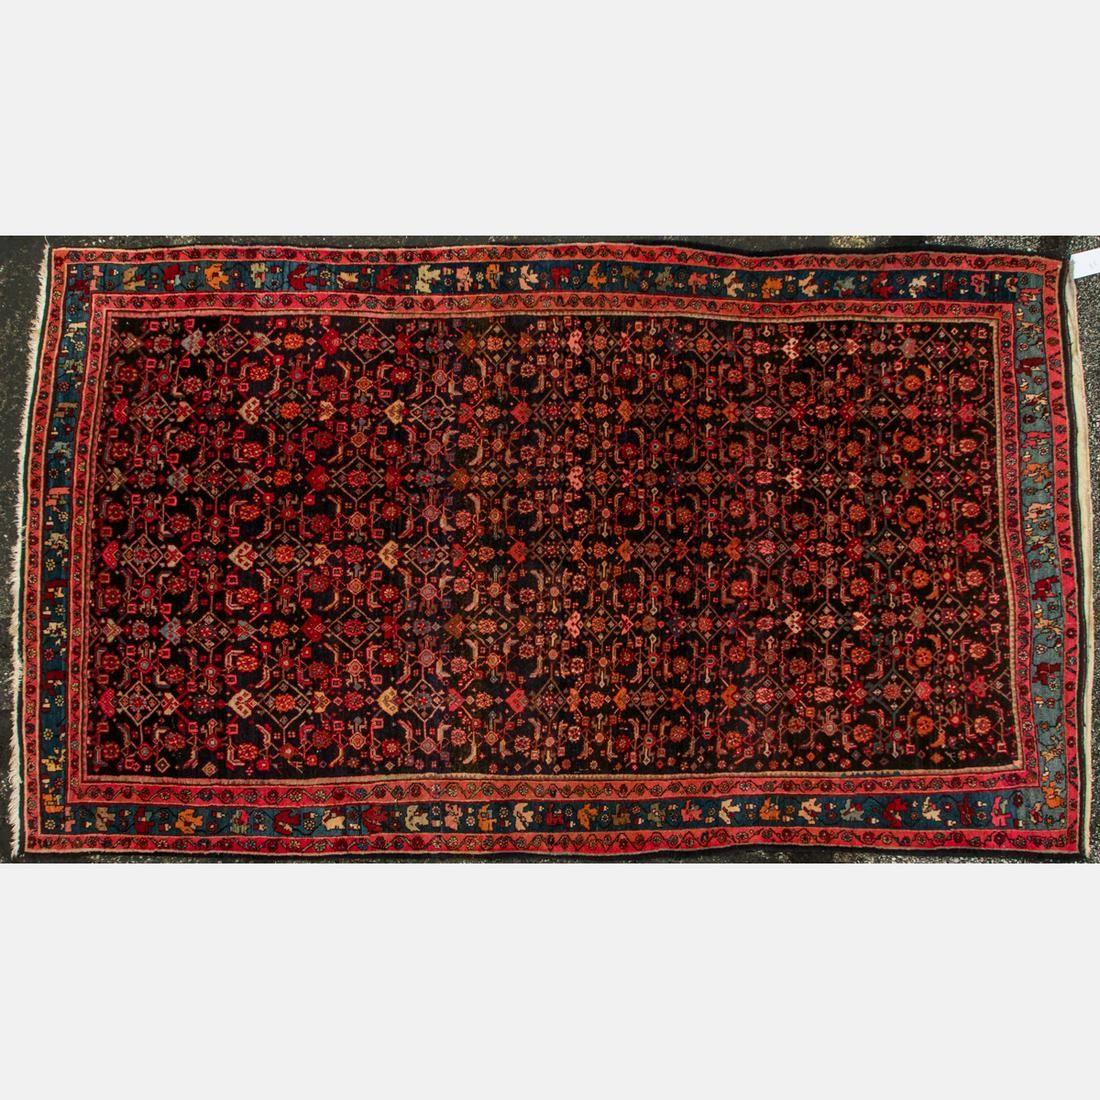 An Antique Persian Bijar Wool Rug, ca. 1930's.